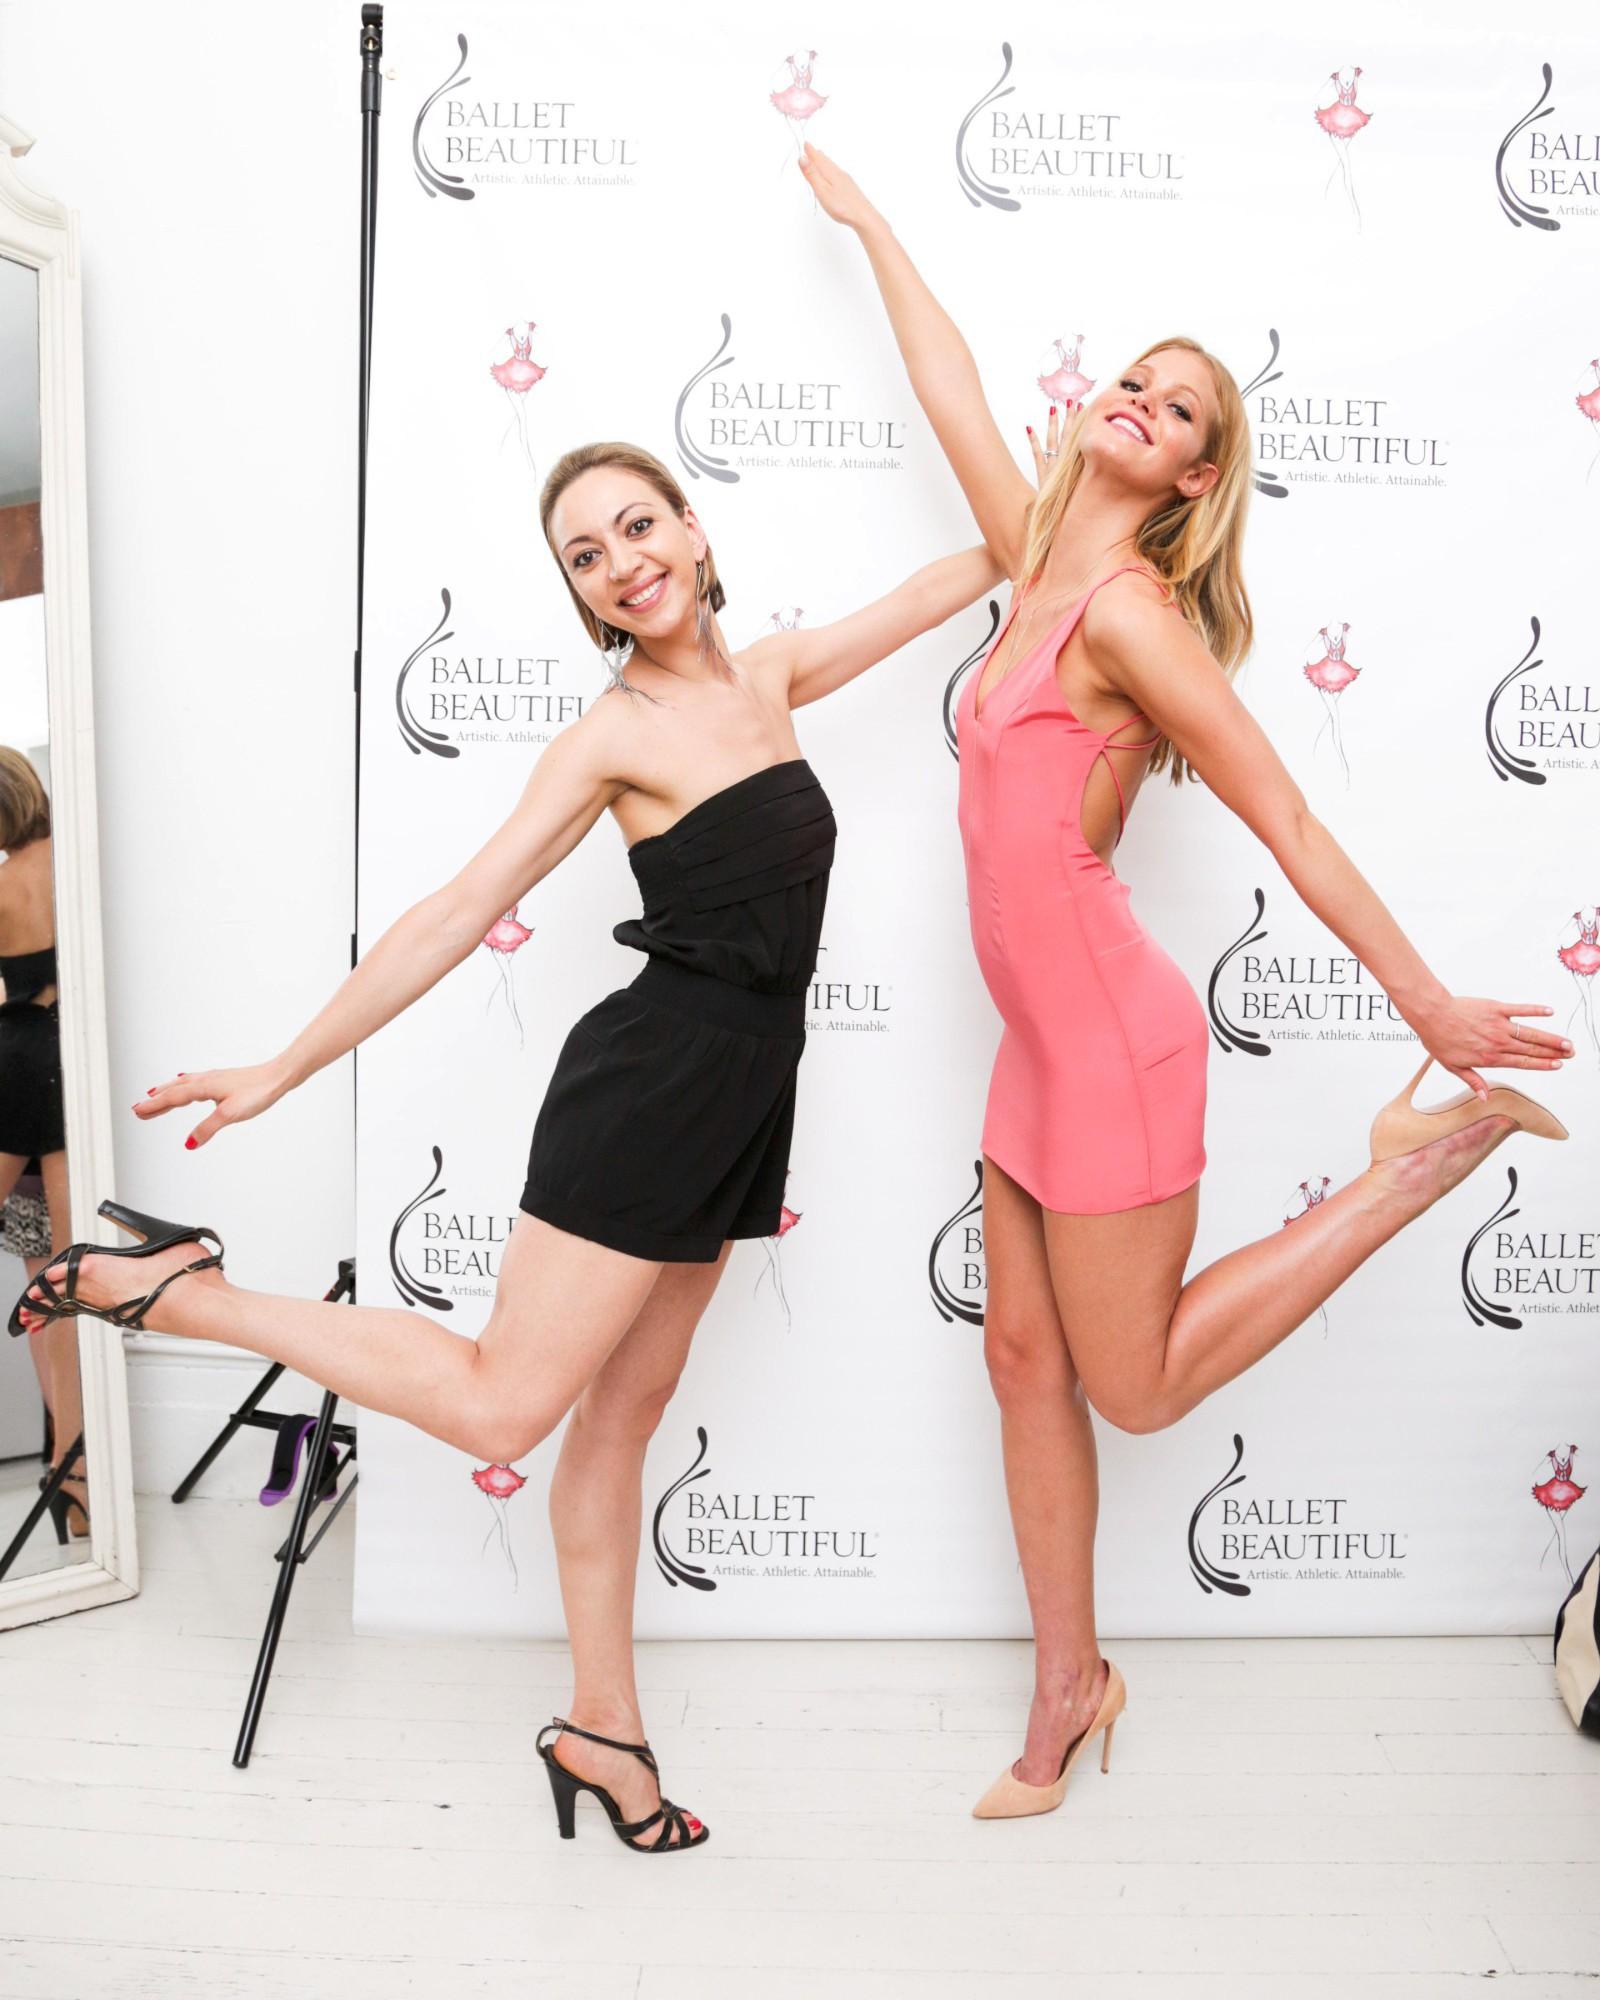 Ballet workout videos online chrome